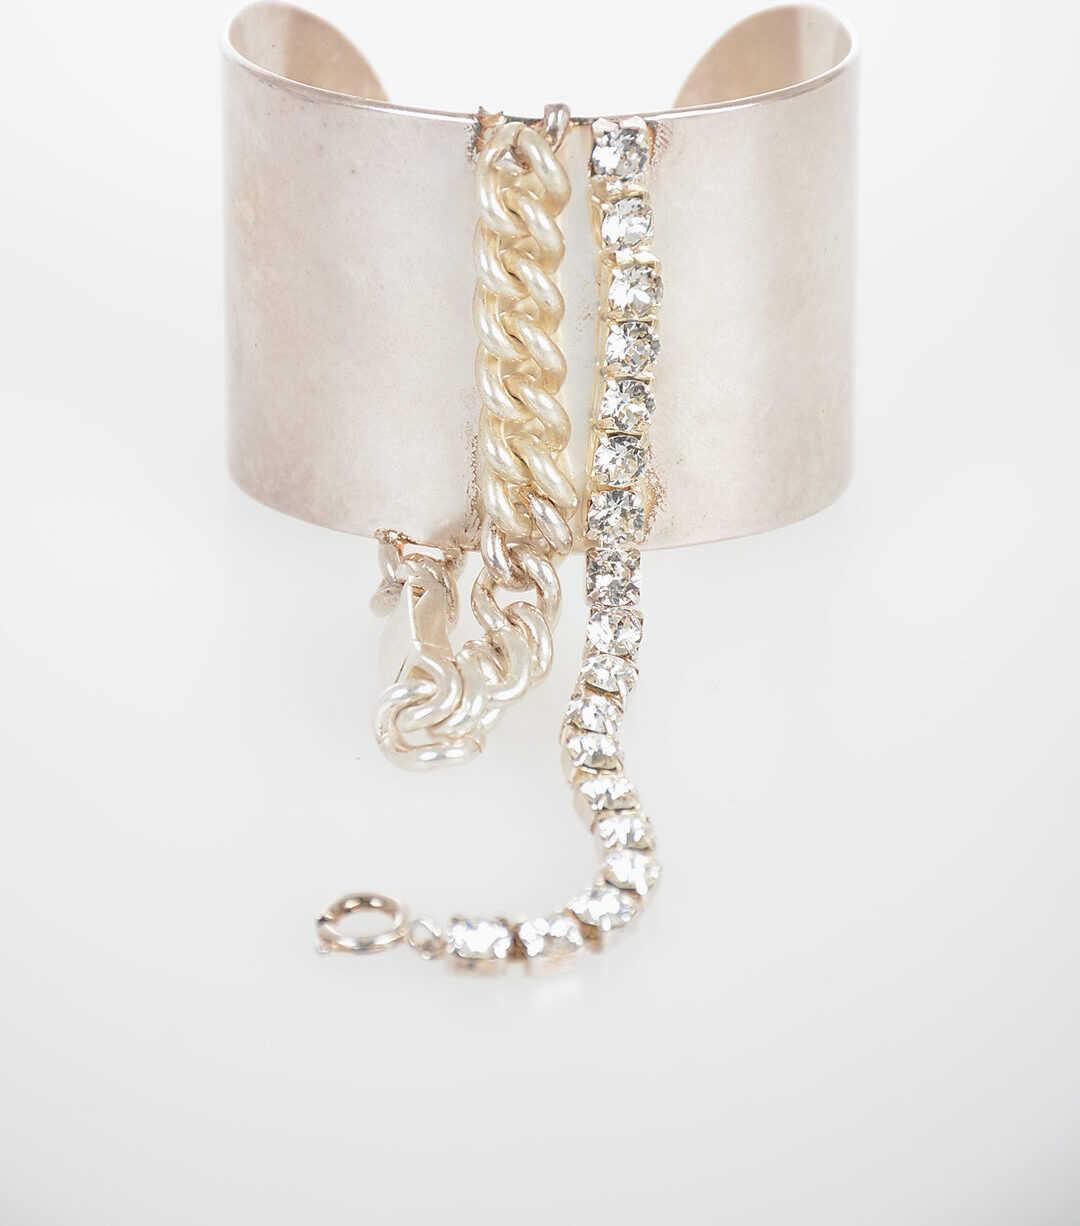 Maison Margiela MM11 Chain and Jewel Bracelet SILVER